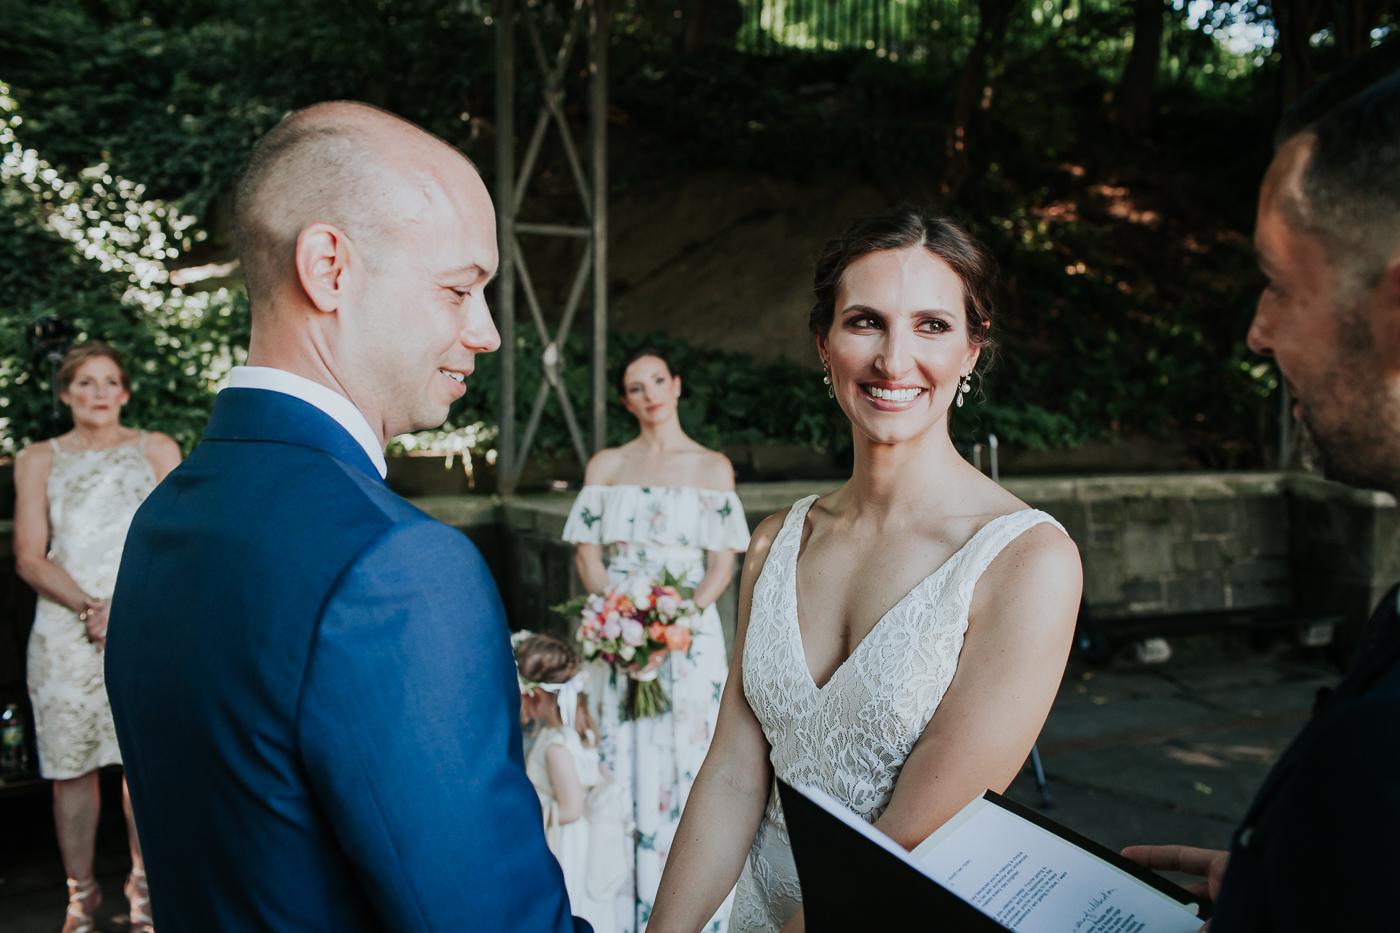 NYC-Central-Park-Conservatory-Garden-Intimate-Elopement-Documentary-Wedding-Photographer-25.jpg